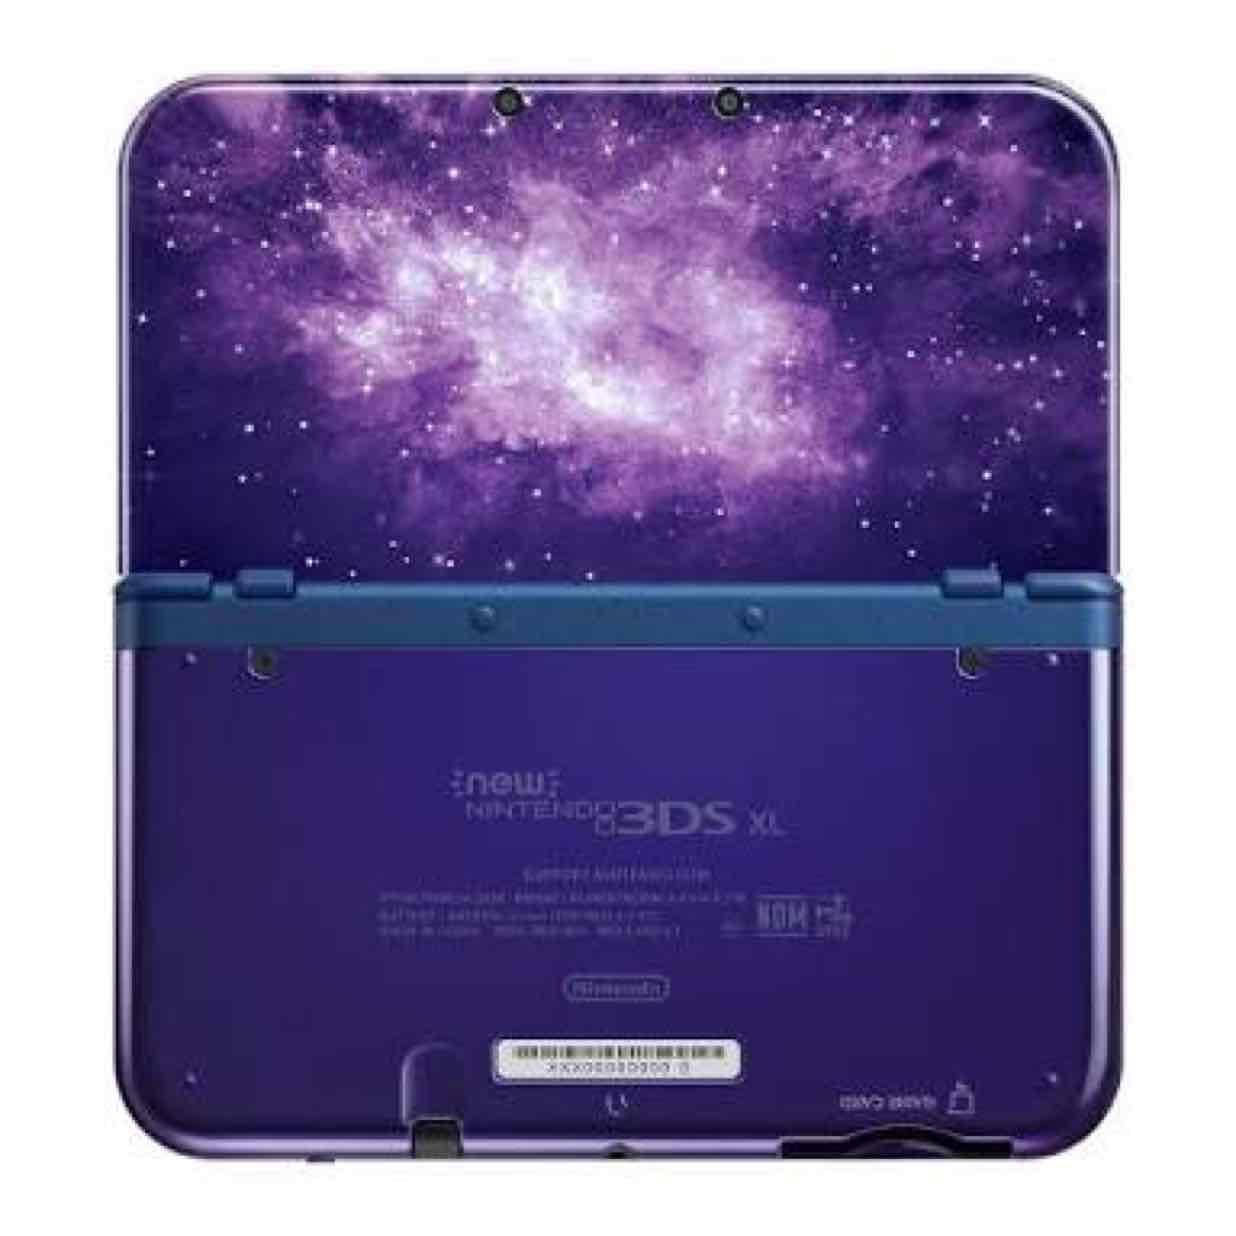 Sanborns: NEW Nintendo 3DS XL edición especial